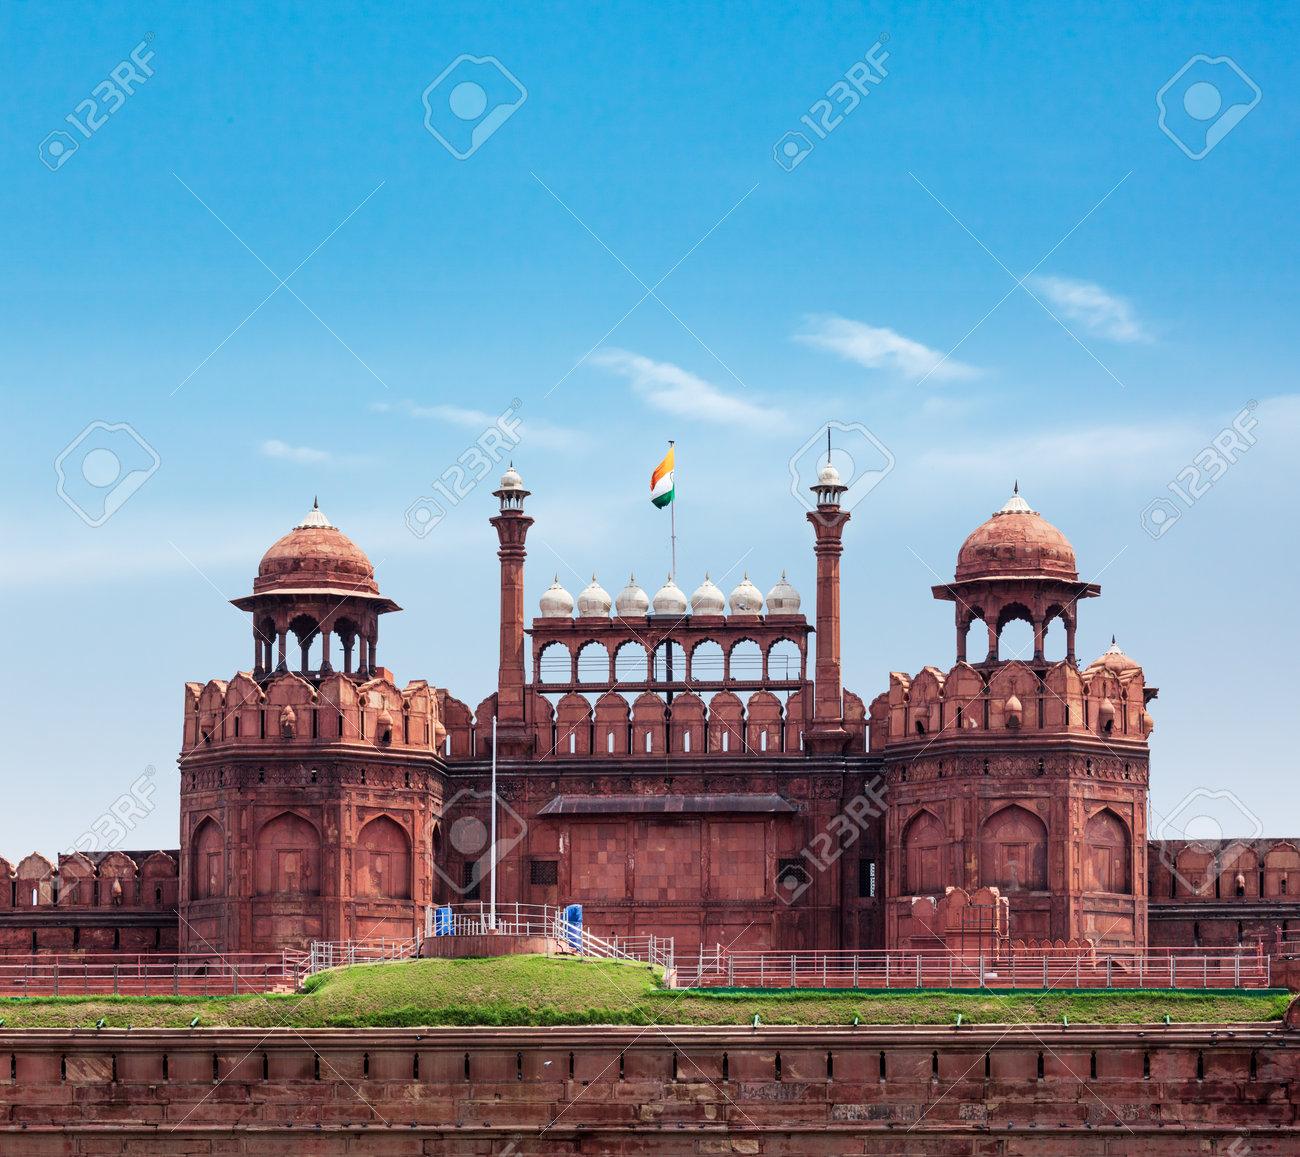 Lal Qila Stock Photos & Lal Qila Stock Images - Alamy